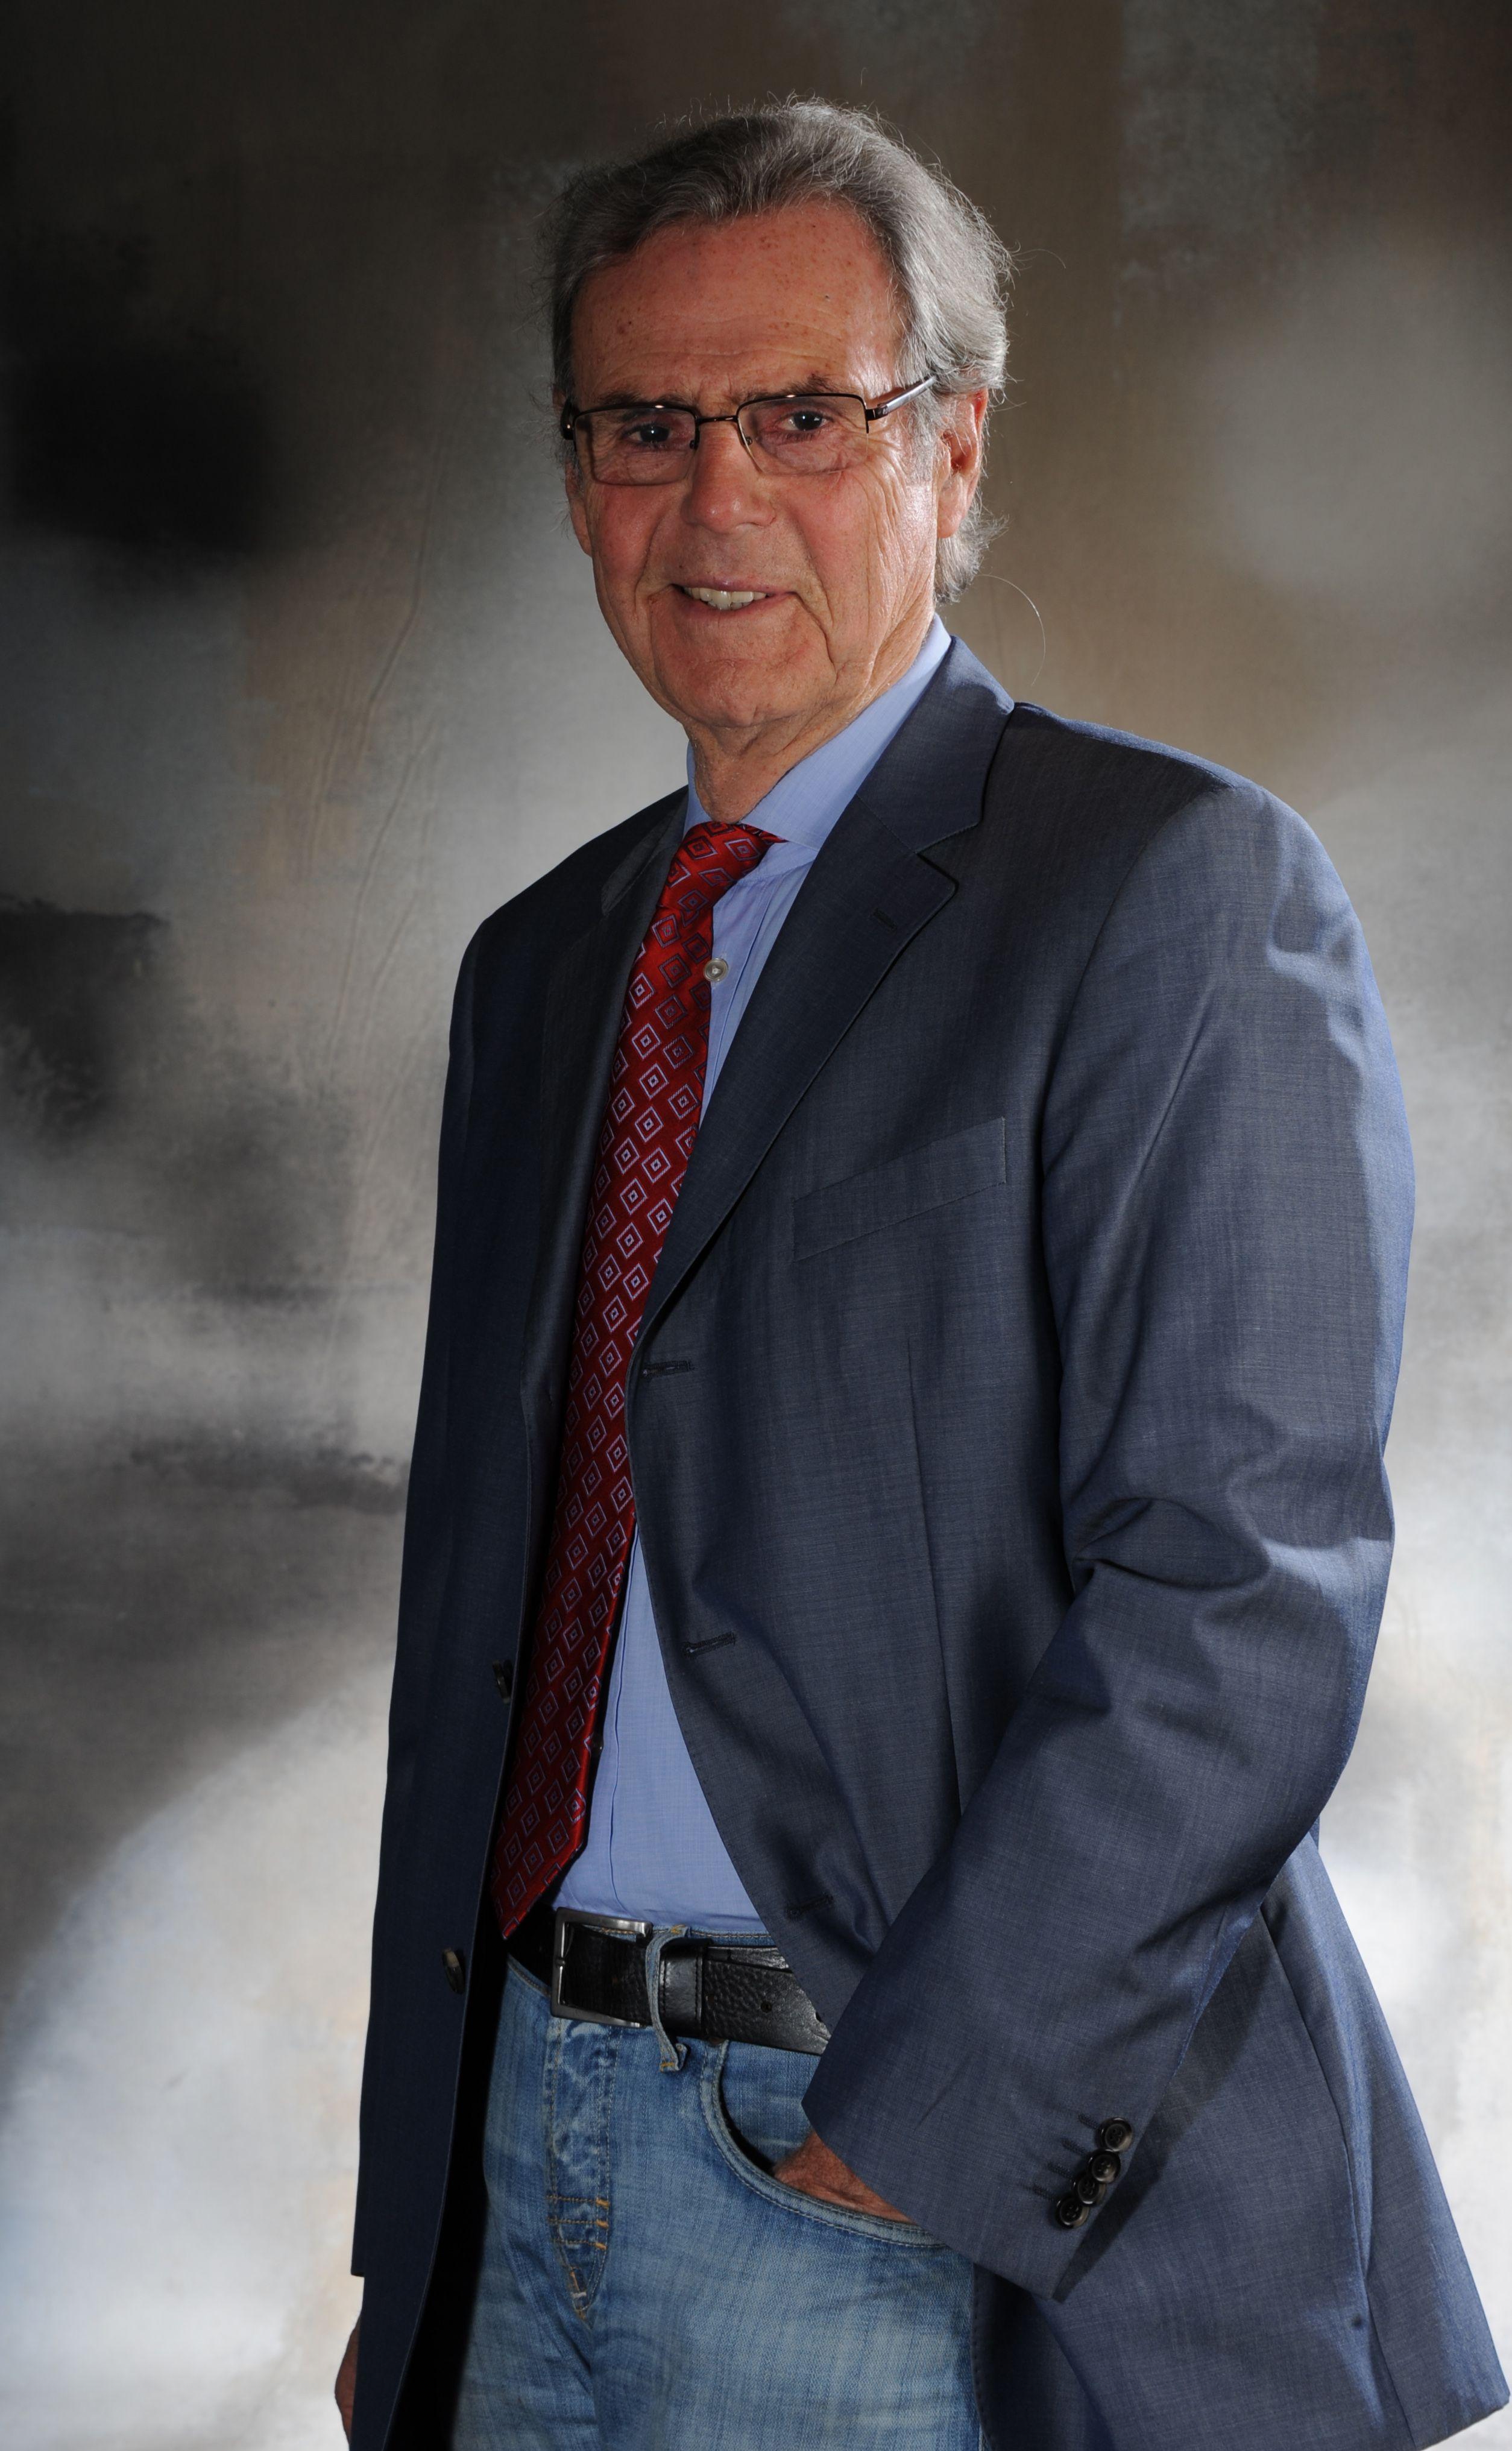 Claudius Zimmermann